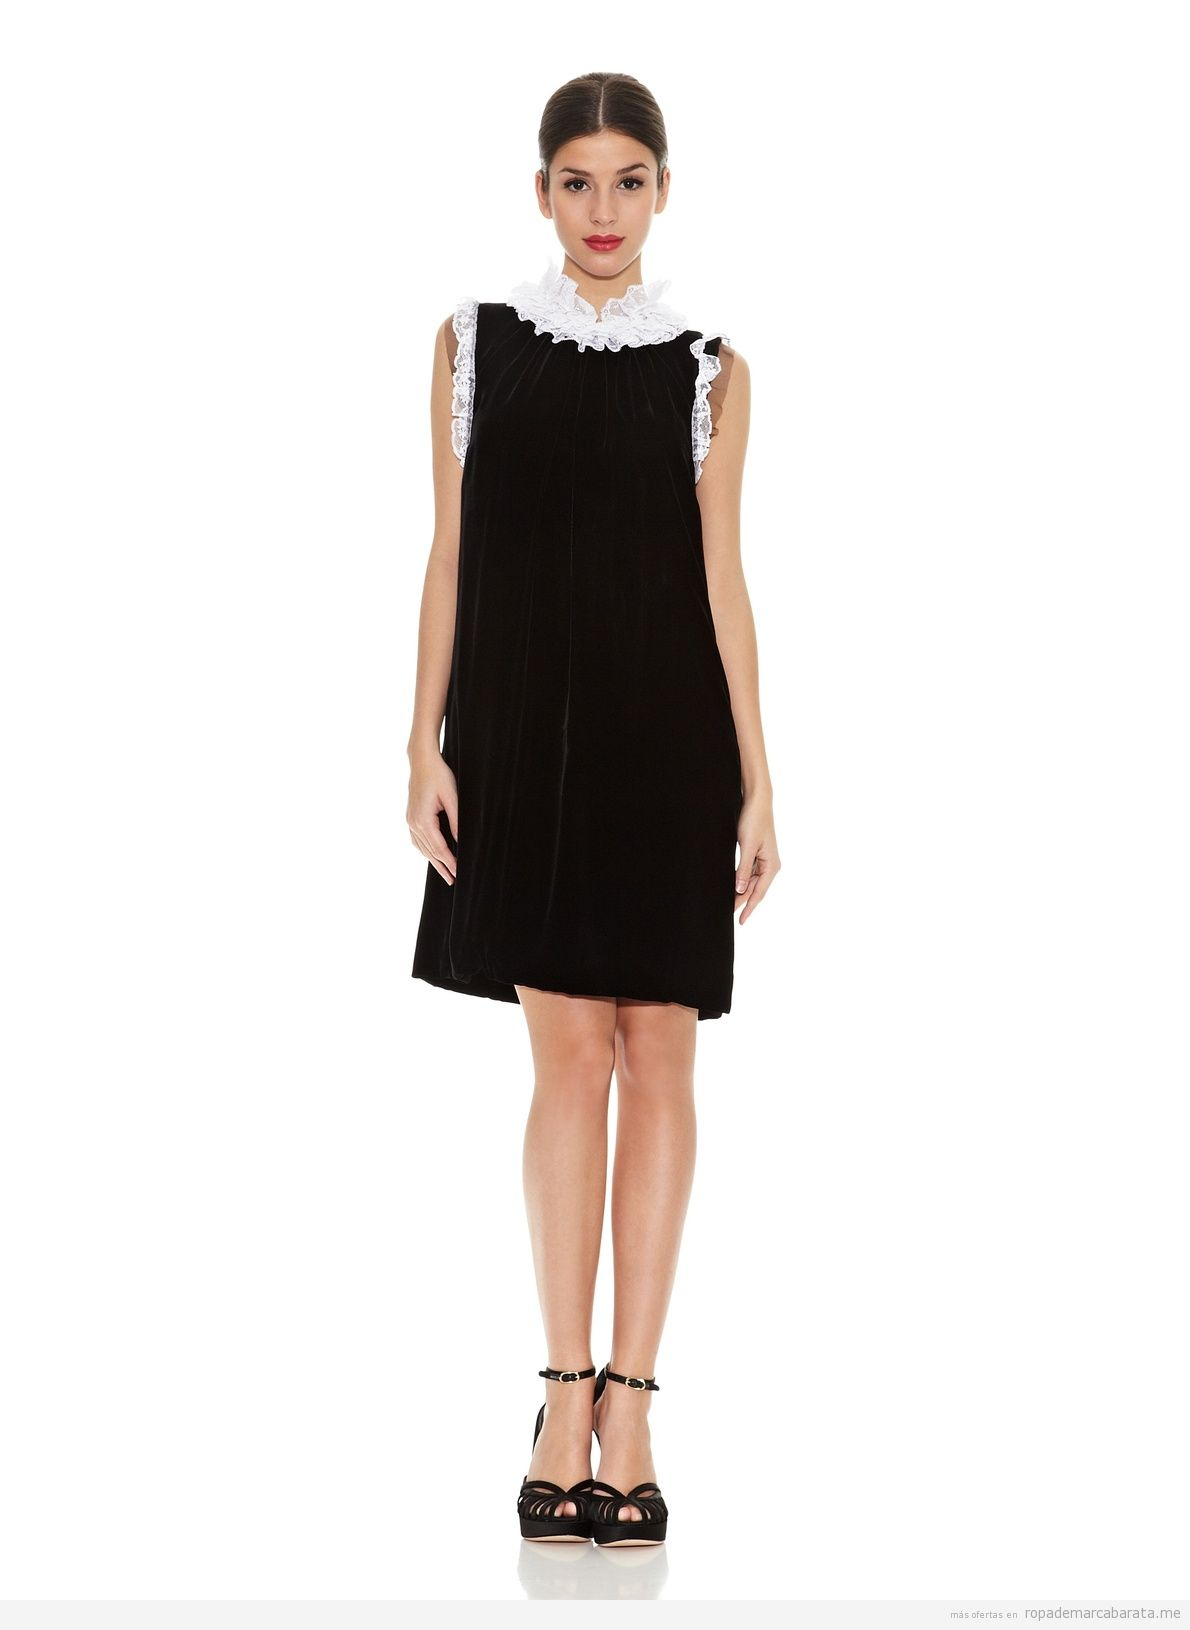 Vestido barato Dolce&Gabbana rebajas. comprar outlet online